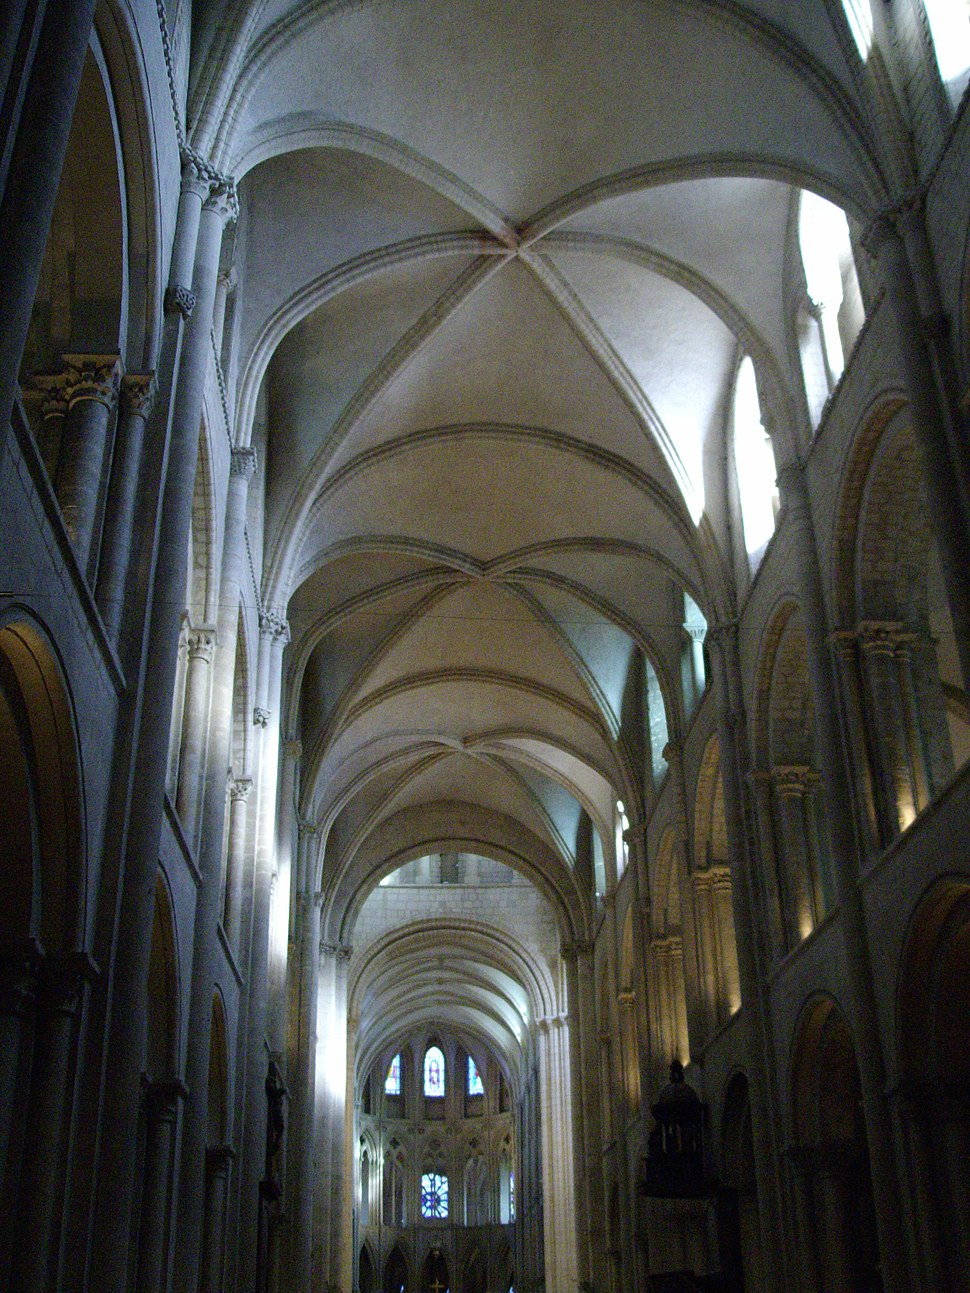 Abbaye aux hommes int%C3%A9rieur 03.jpeg